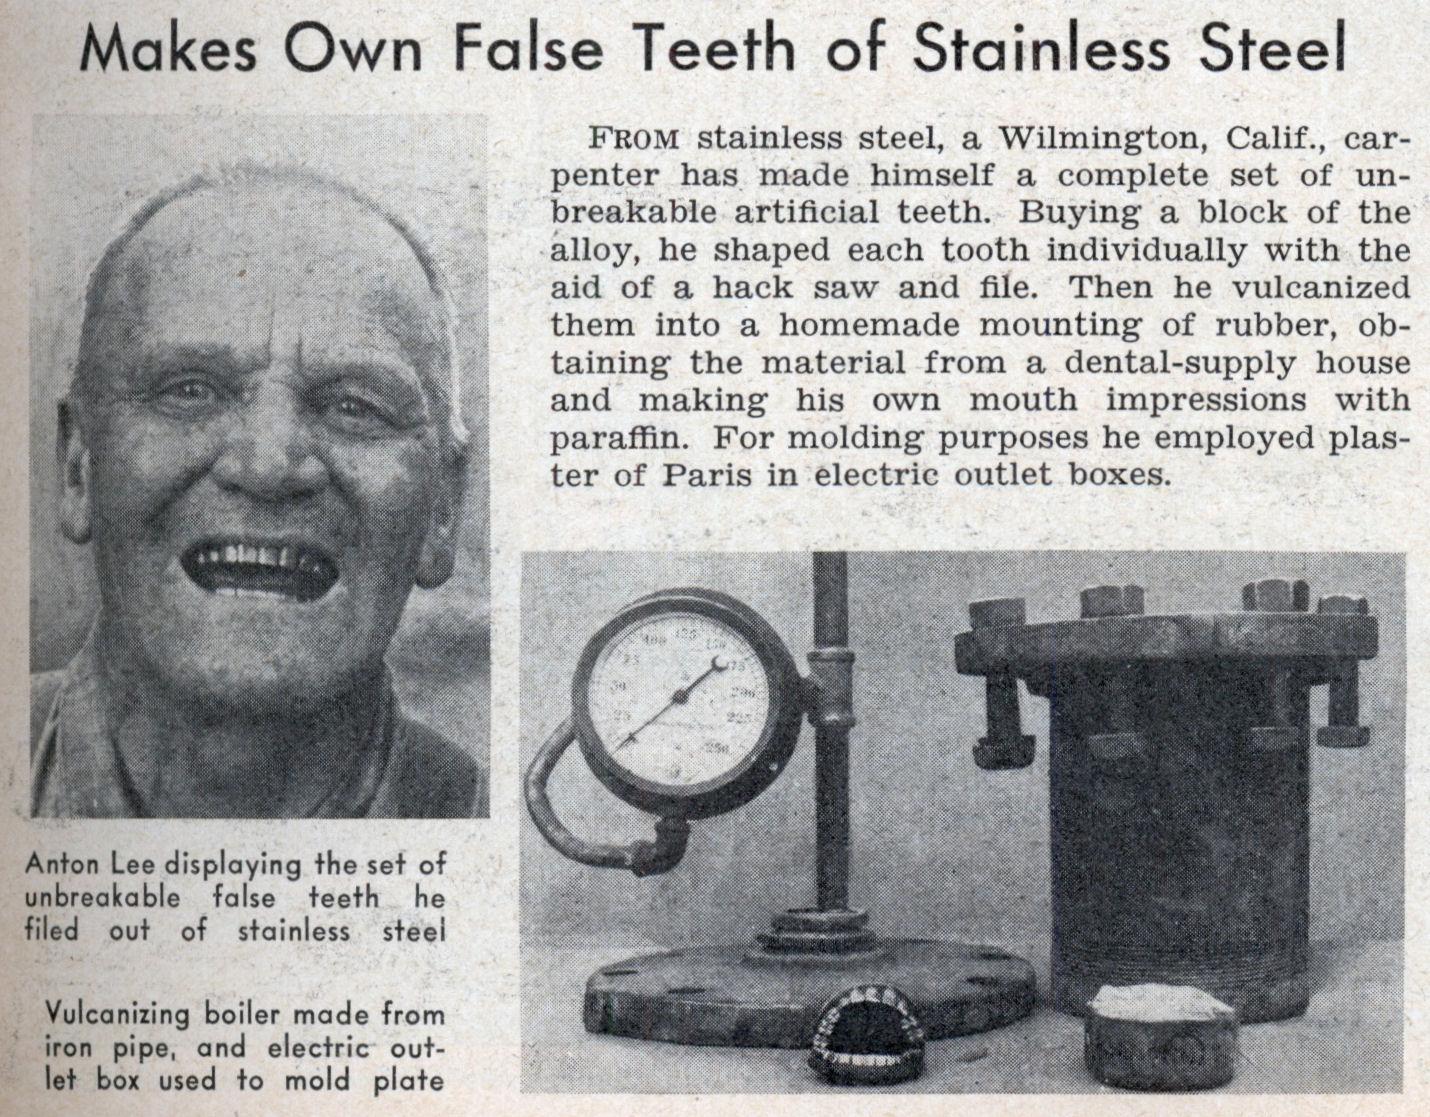 man_makes_fake_teeth-jpg.43725_TEETH_Staying Healthy_Squat the Planet_5:03 PM